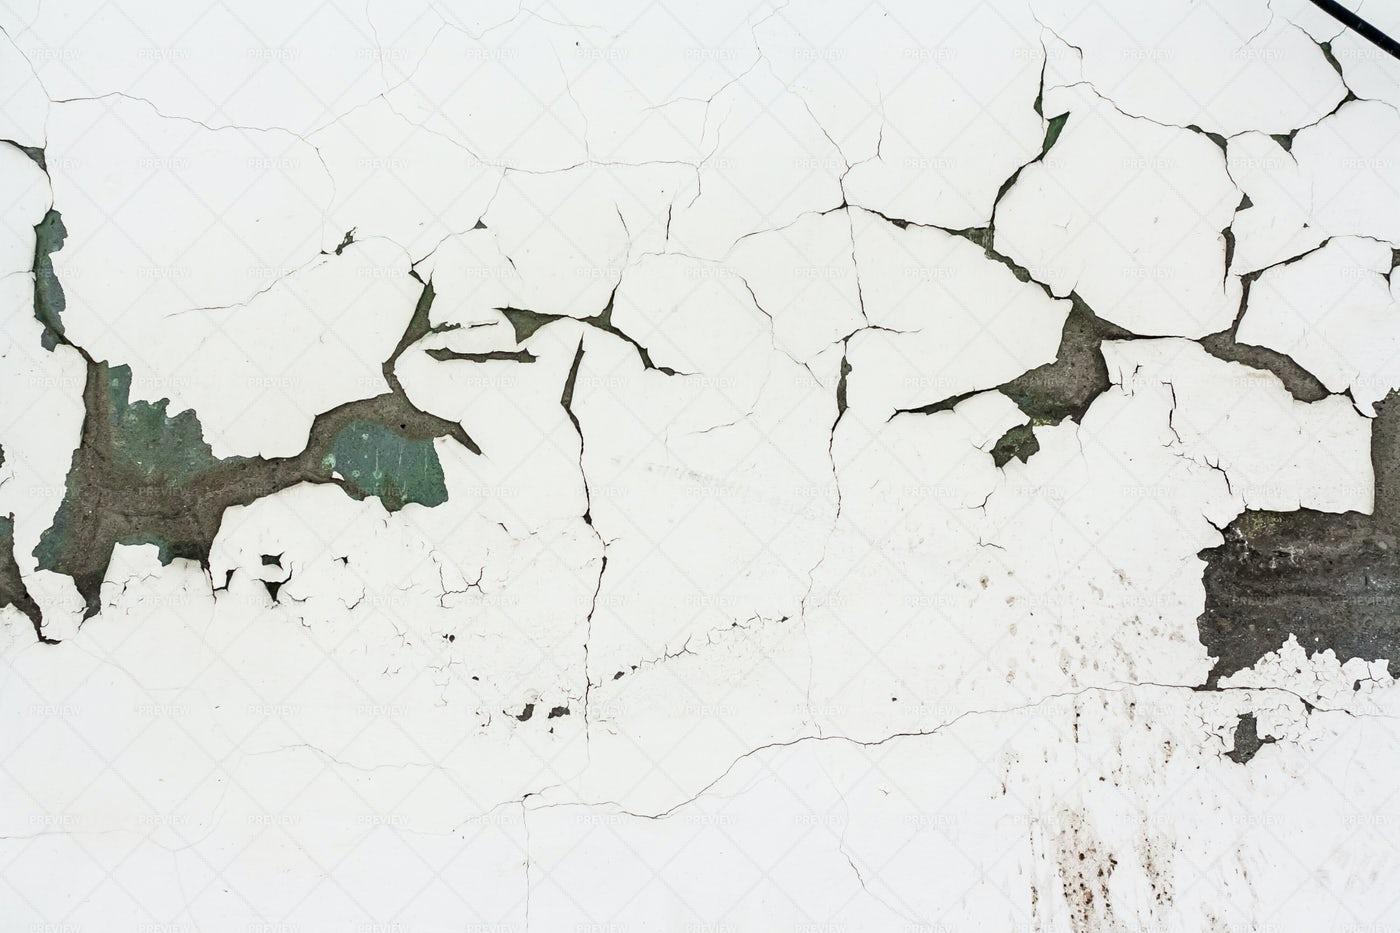 Plaster Cracked Wall: Stock Photos